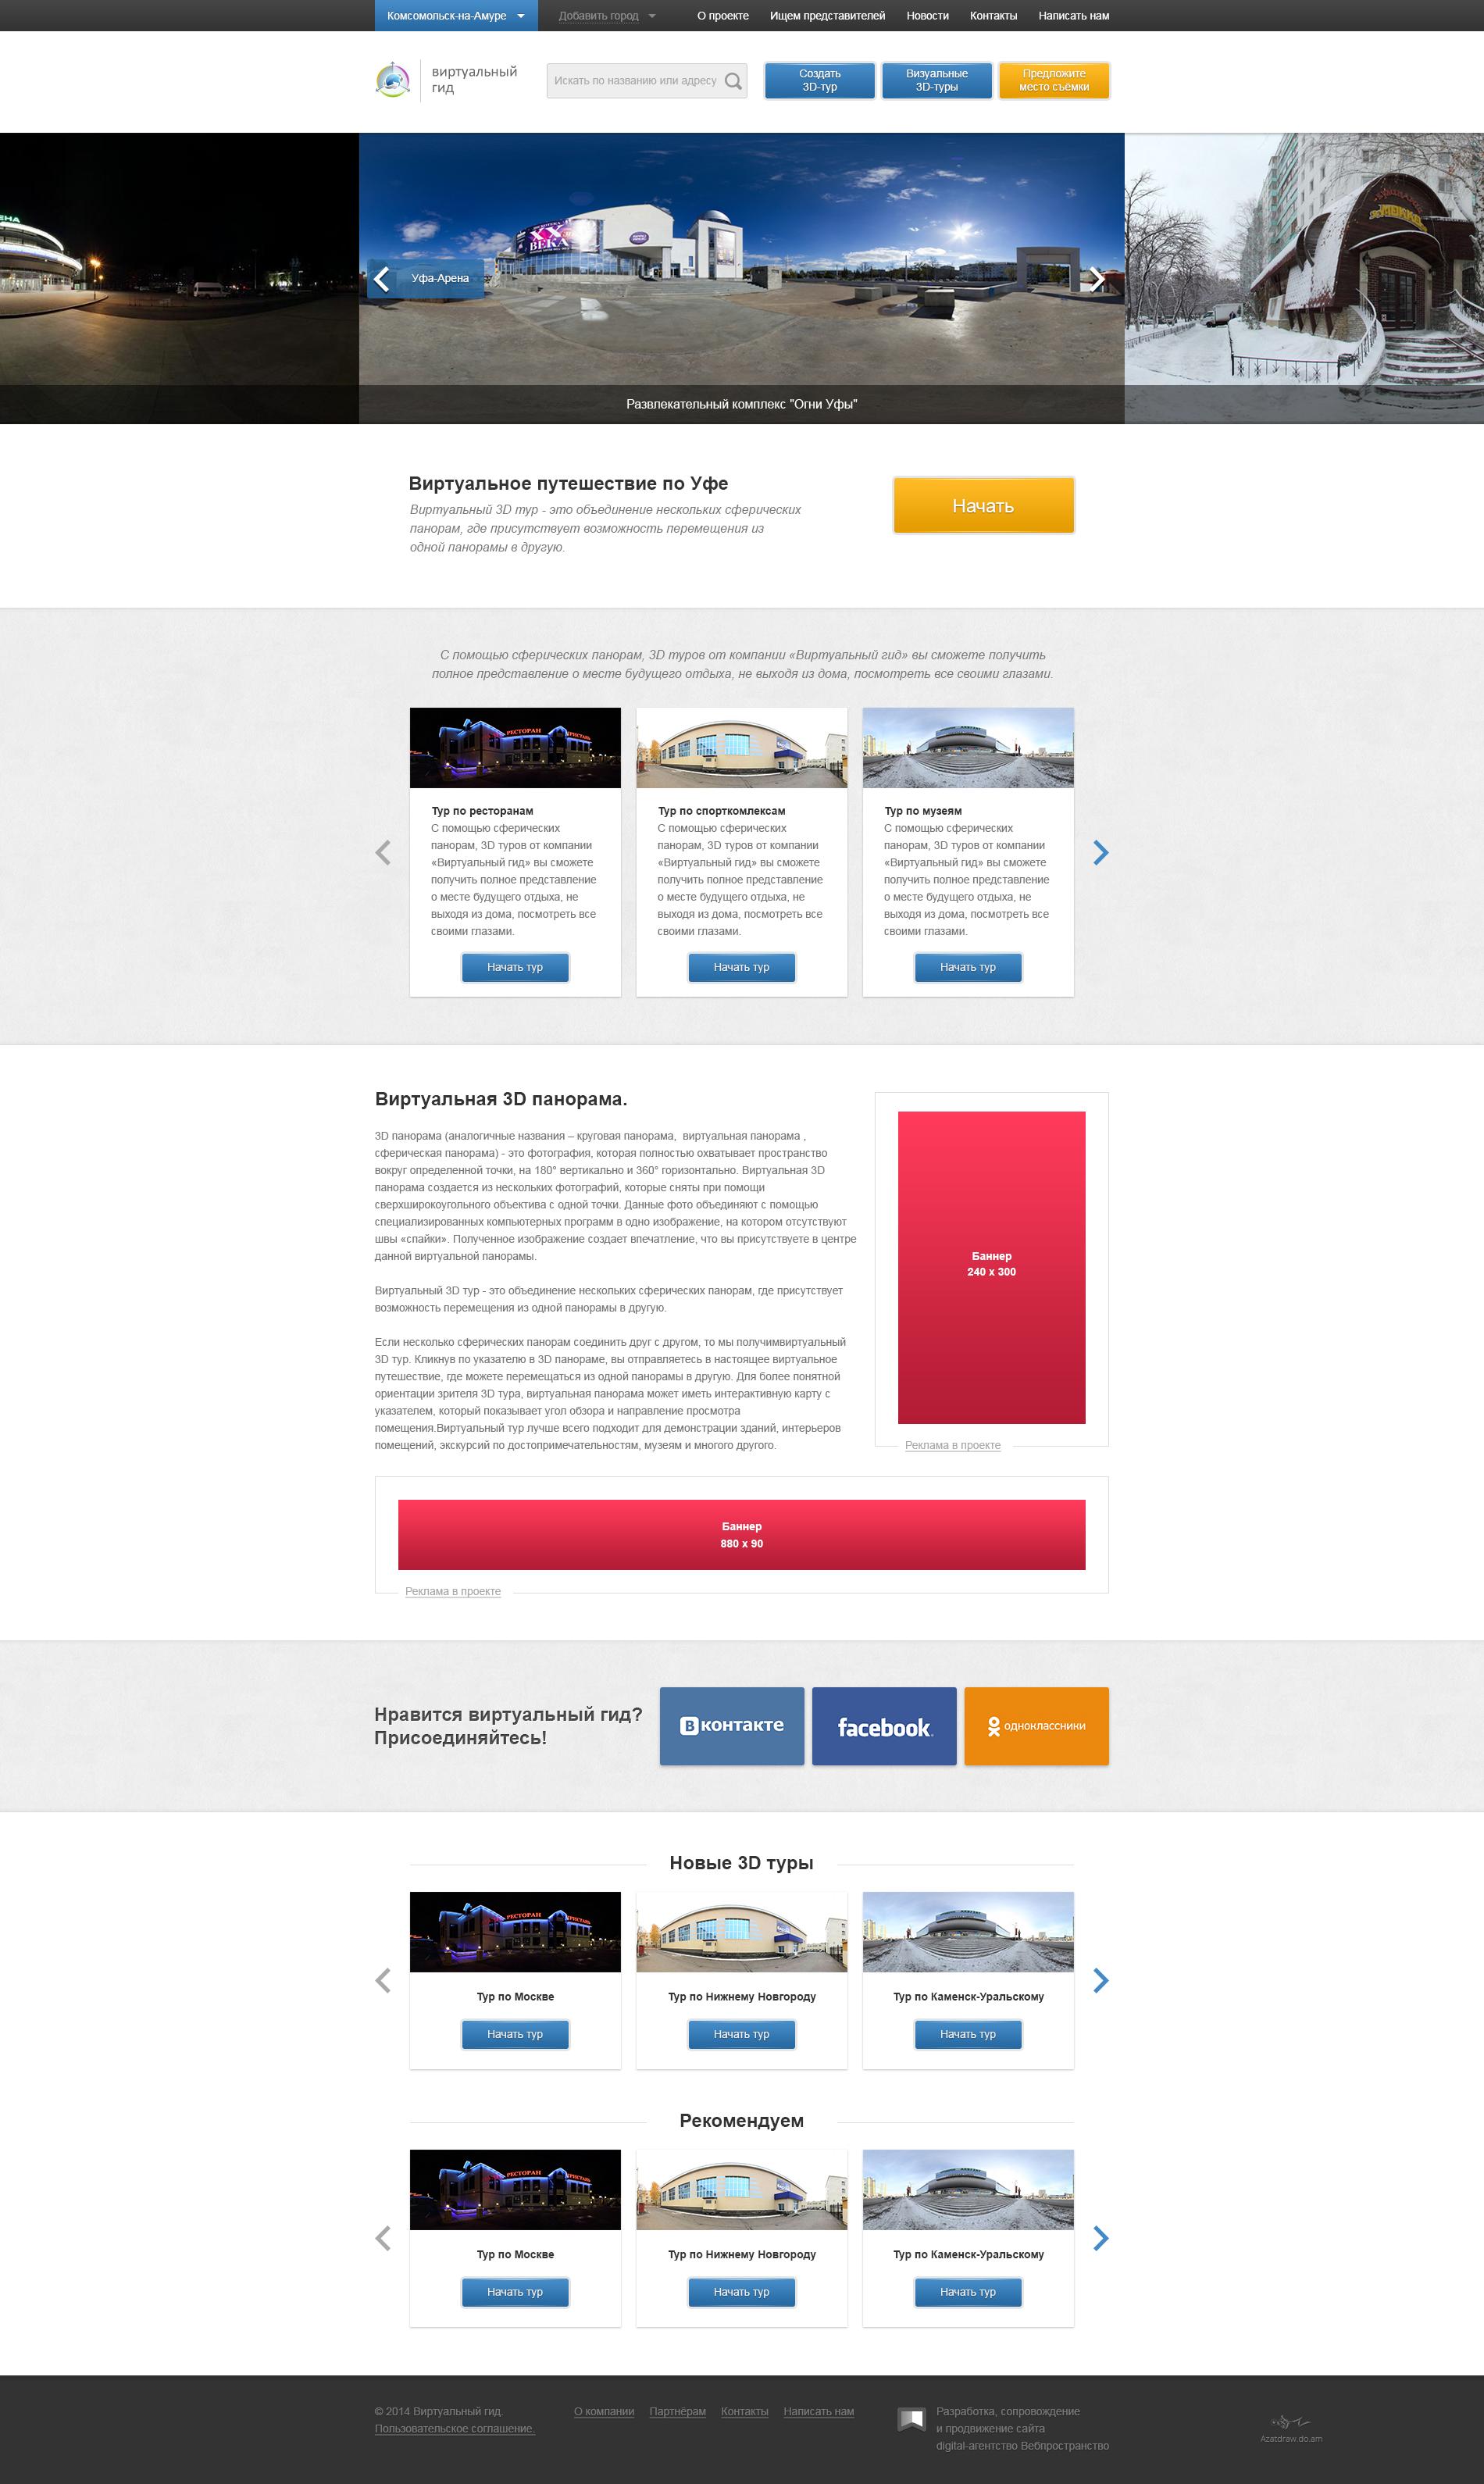 COMM Web Design #31 by Azatdraw